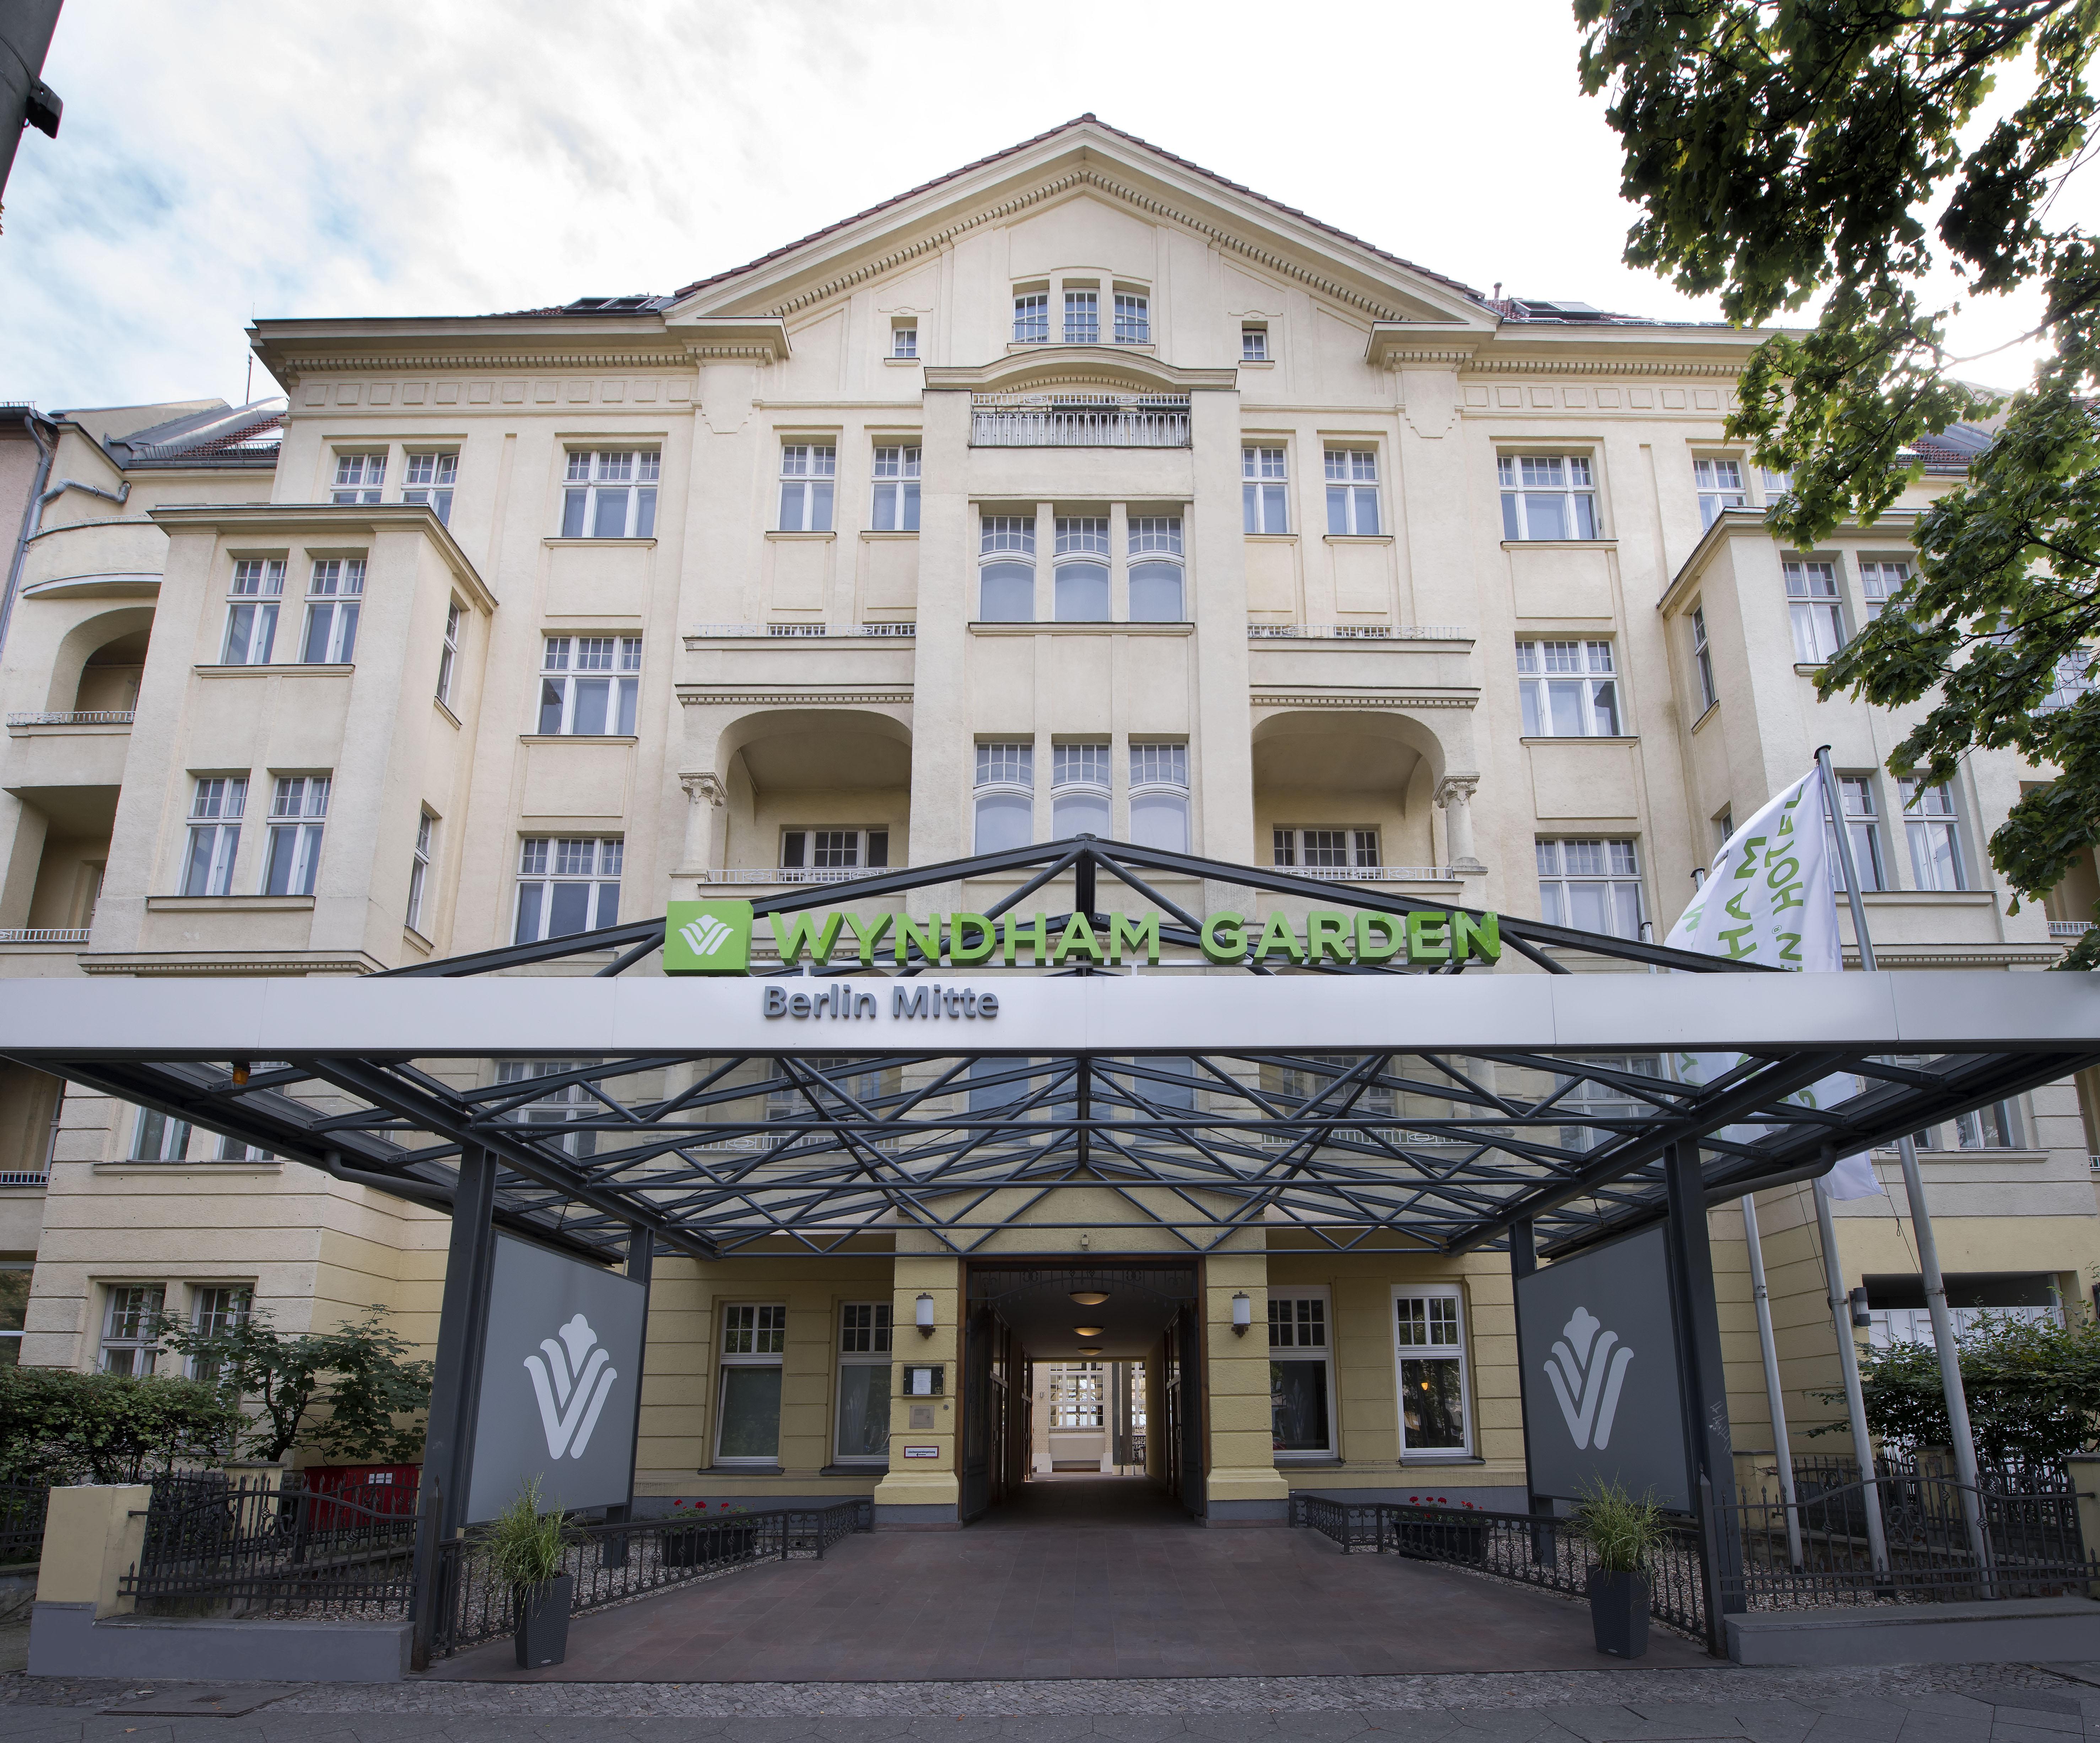 Gesundbrunnen Berlin Hotel